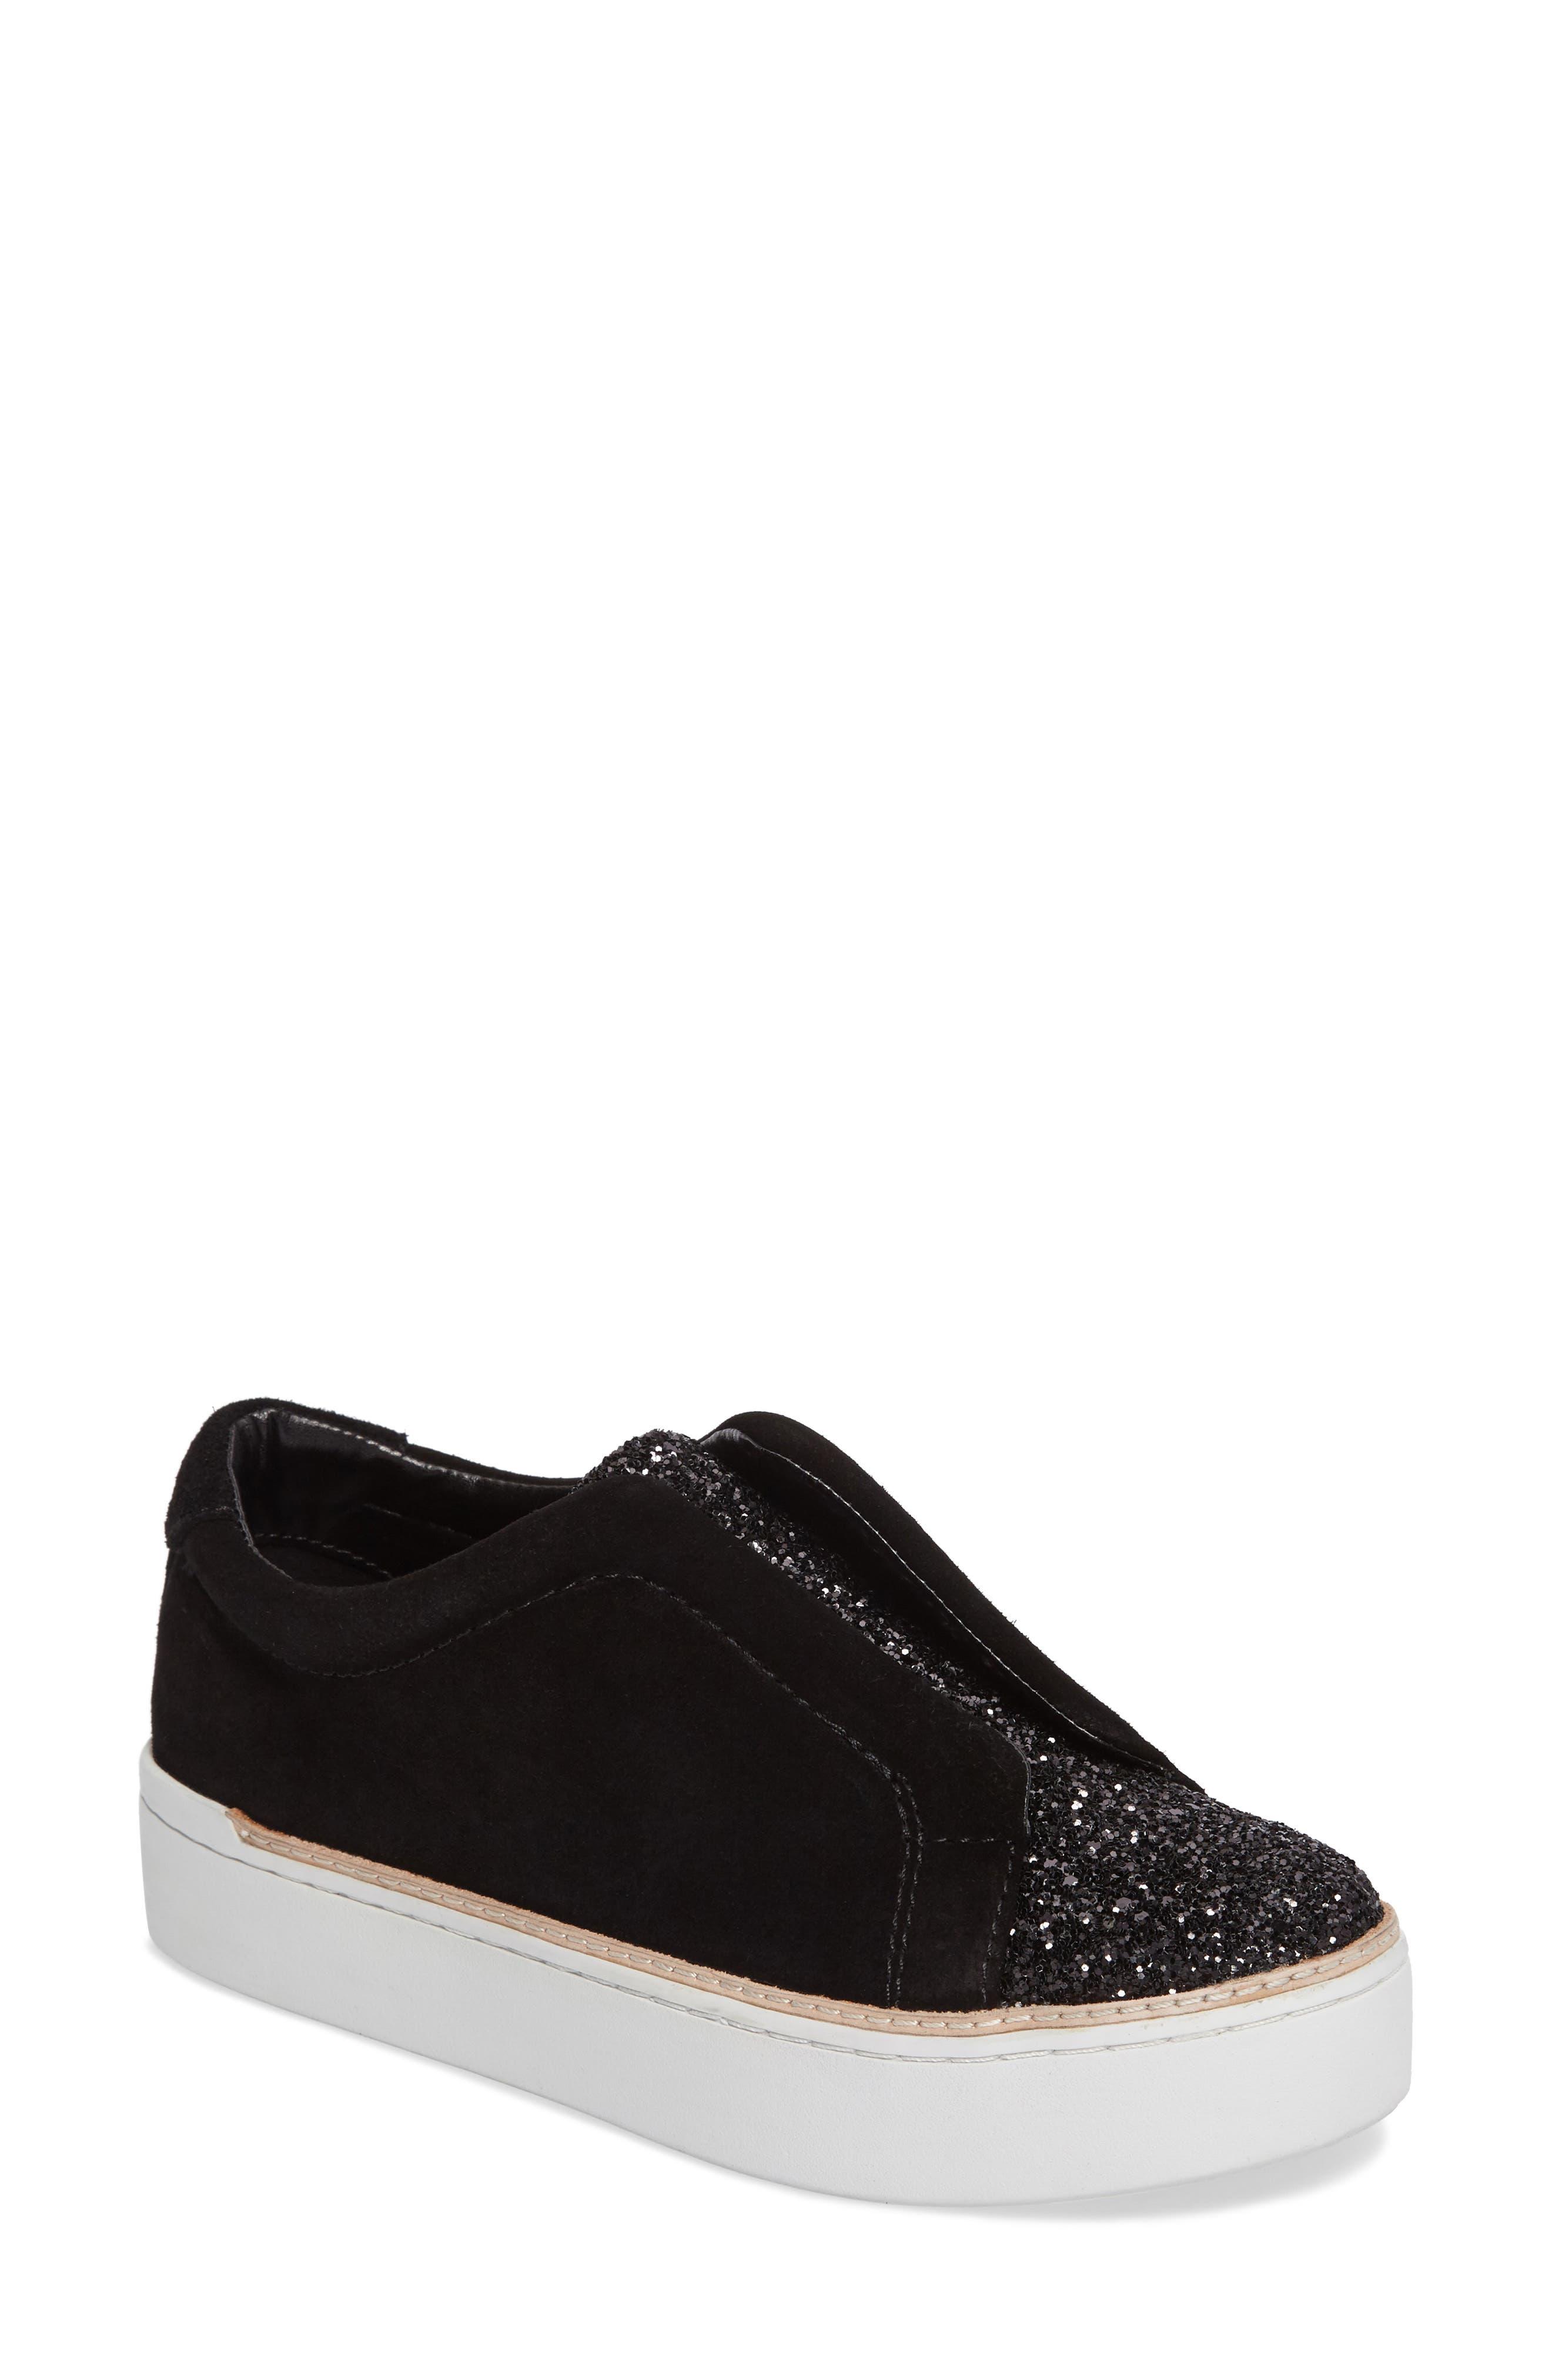 M4D3 Super Slip-On Sneaker, Main, color, BLACK GLITTER LEATHER